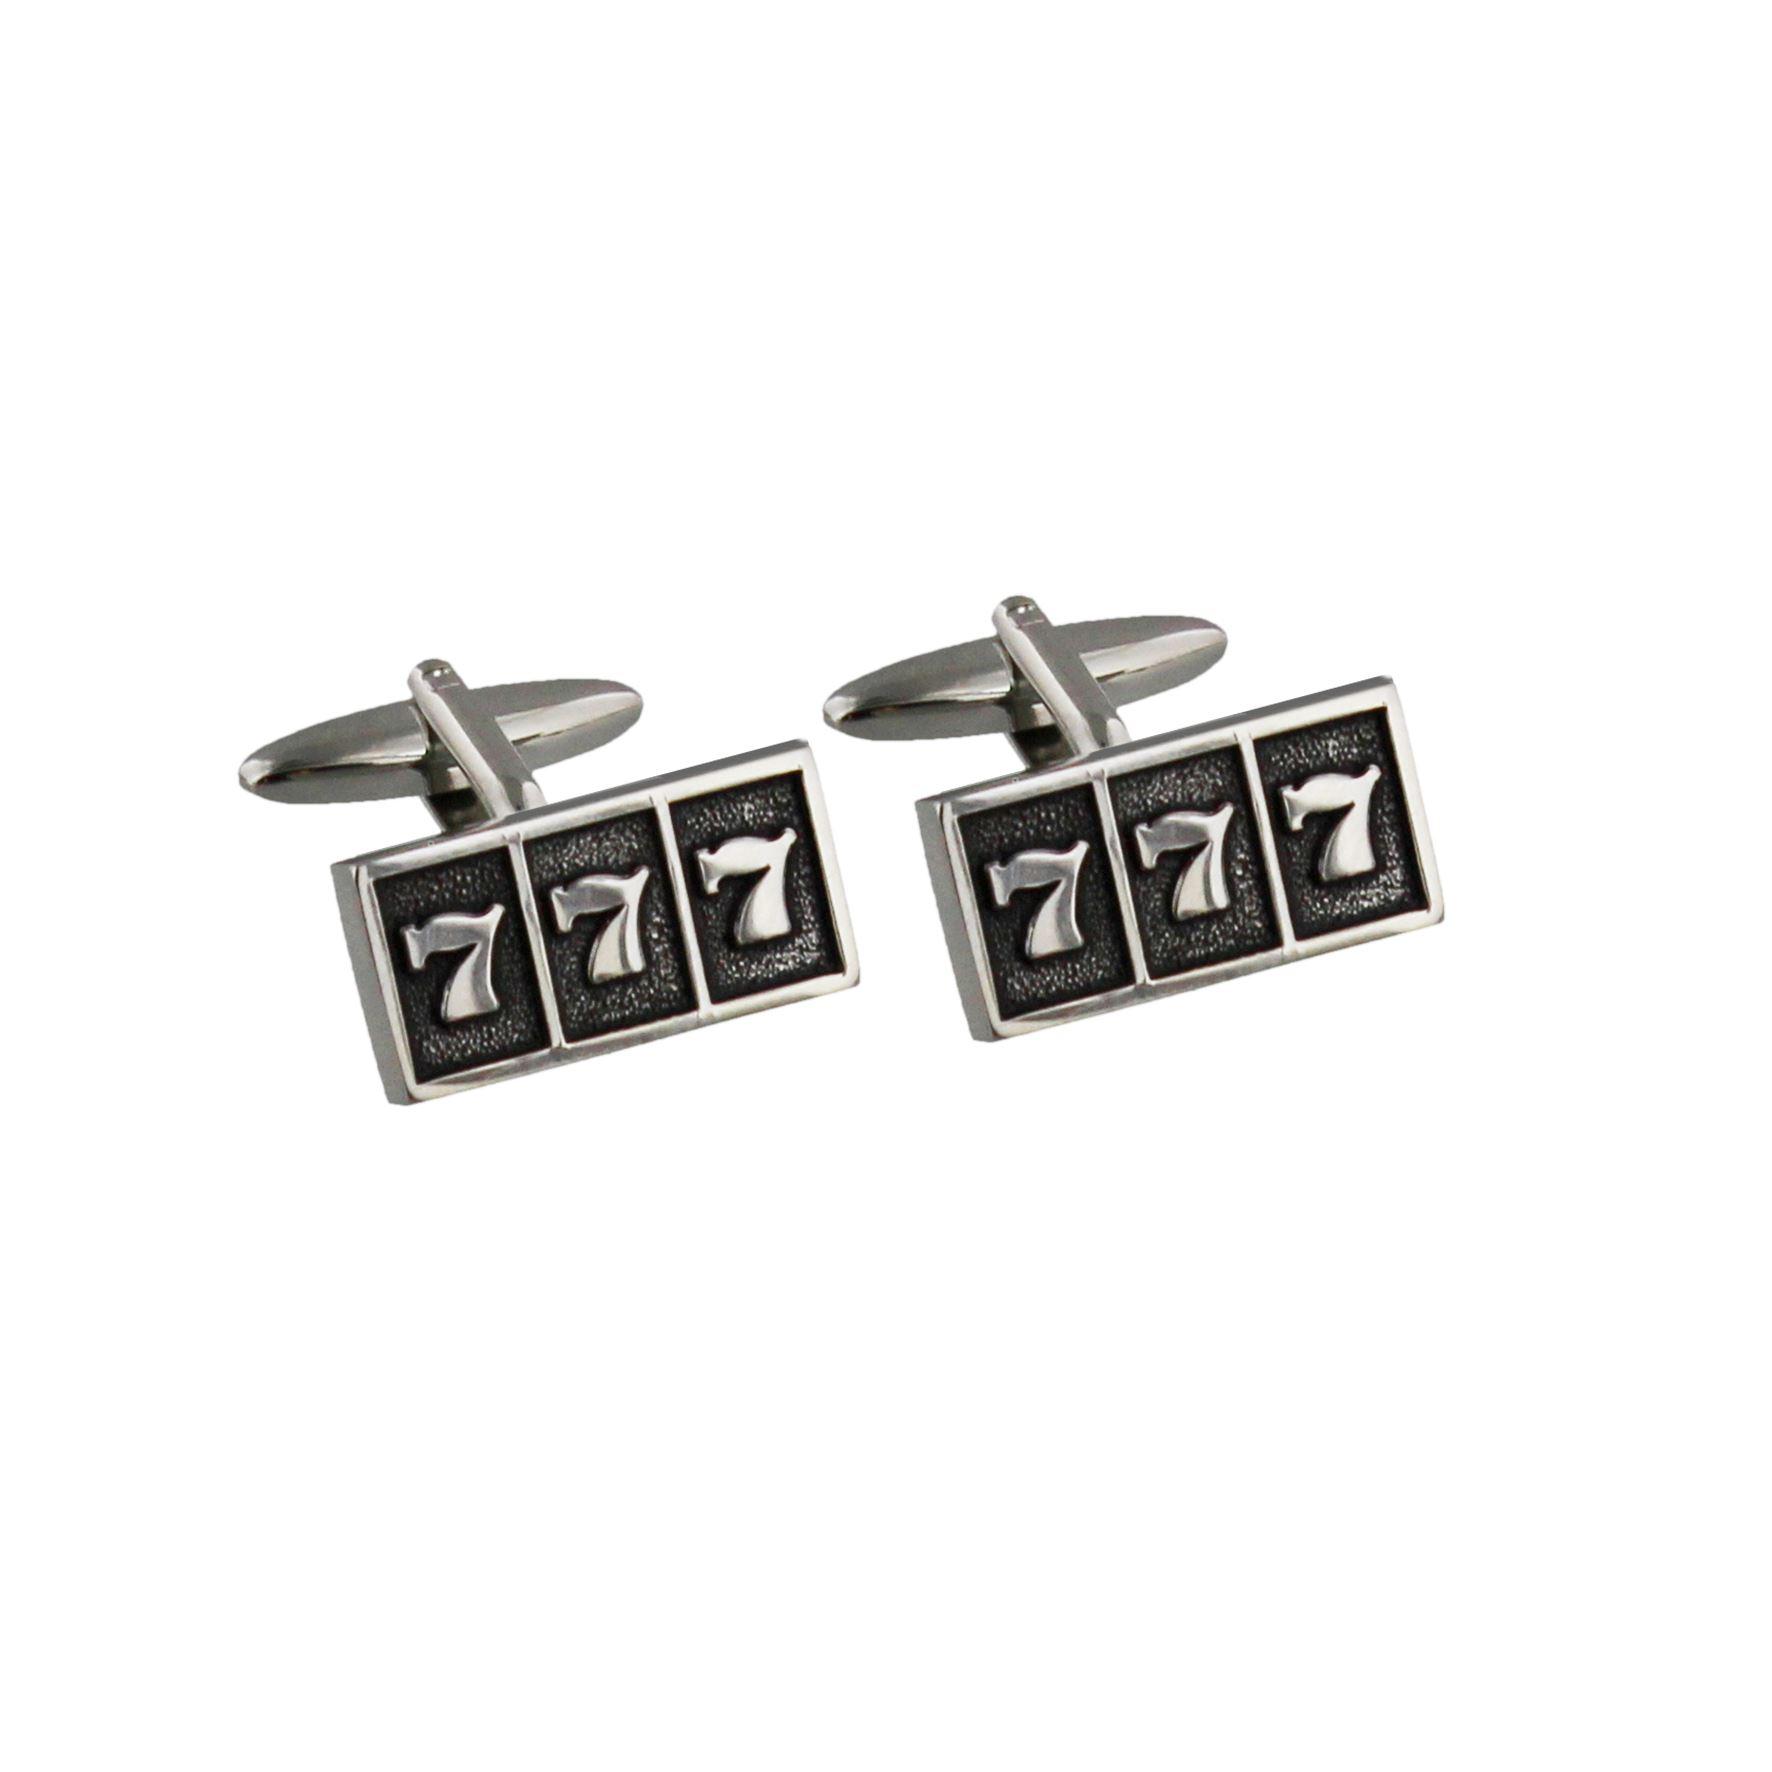 Monte Carlo Silver & Black Cufflinks - 7 7 7